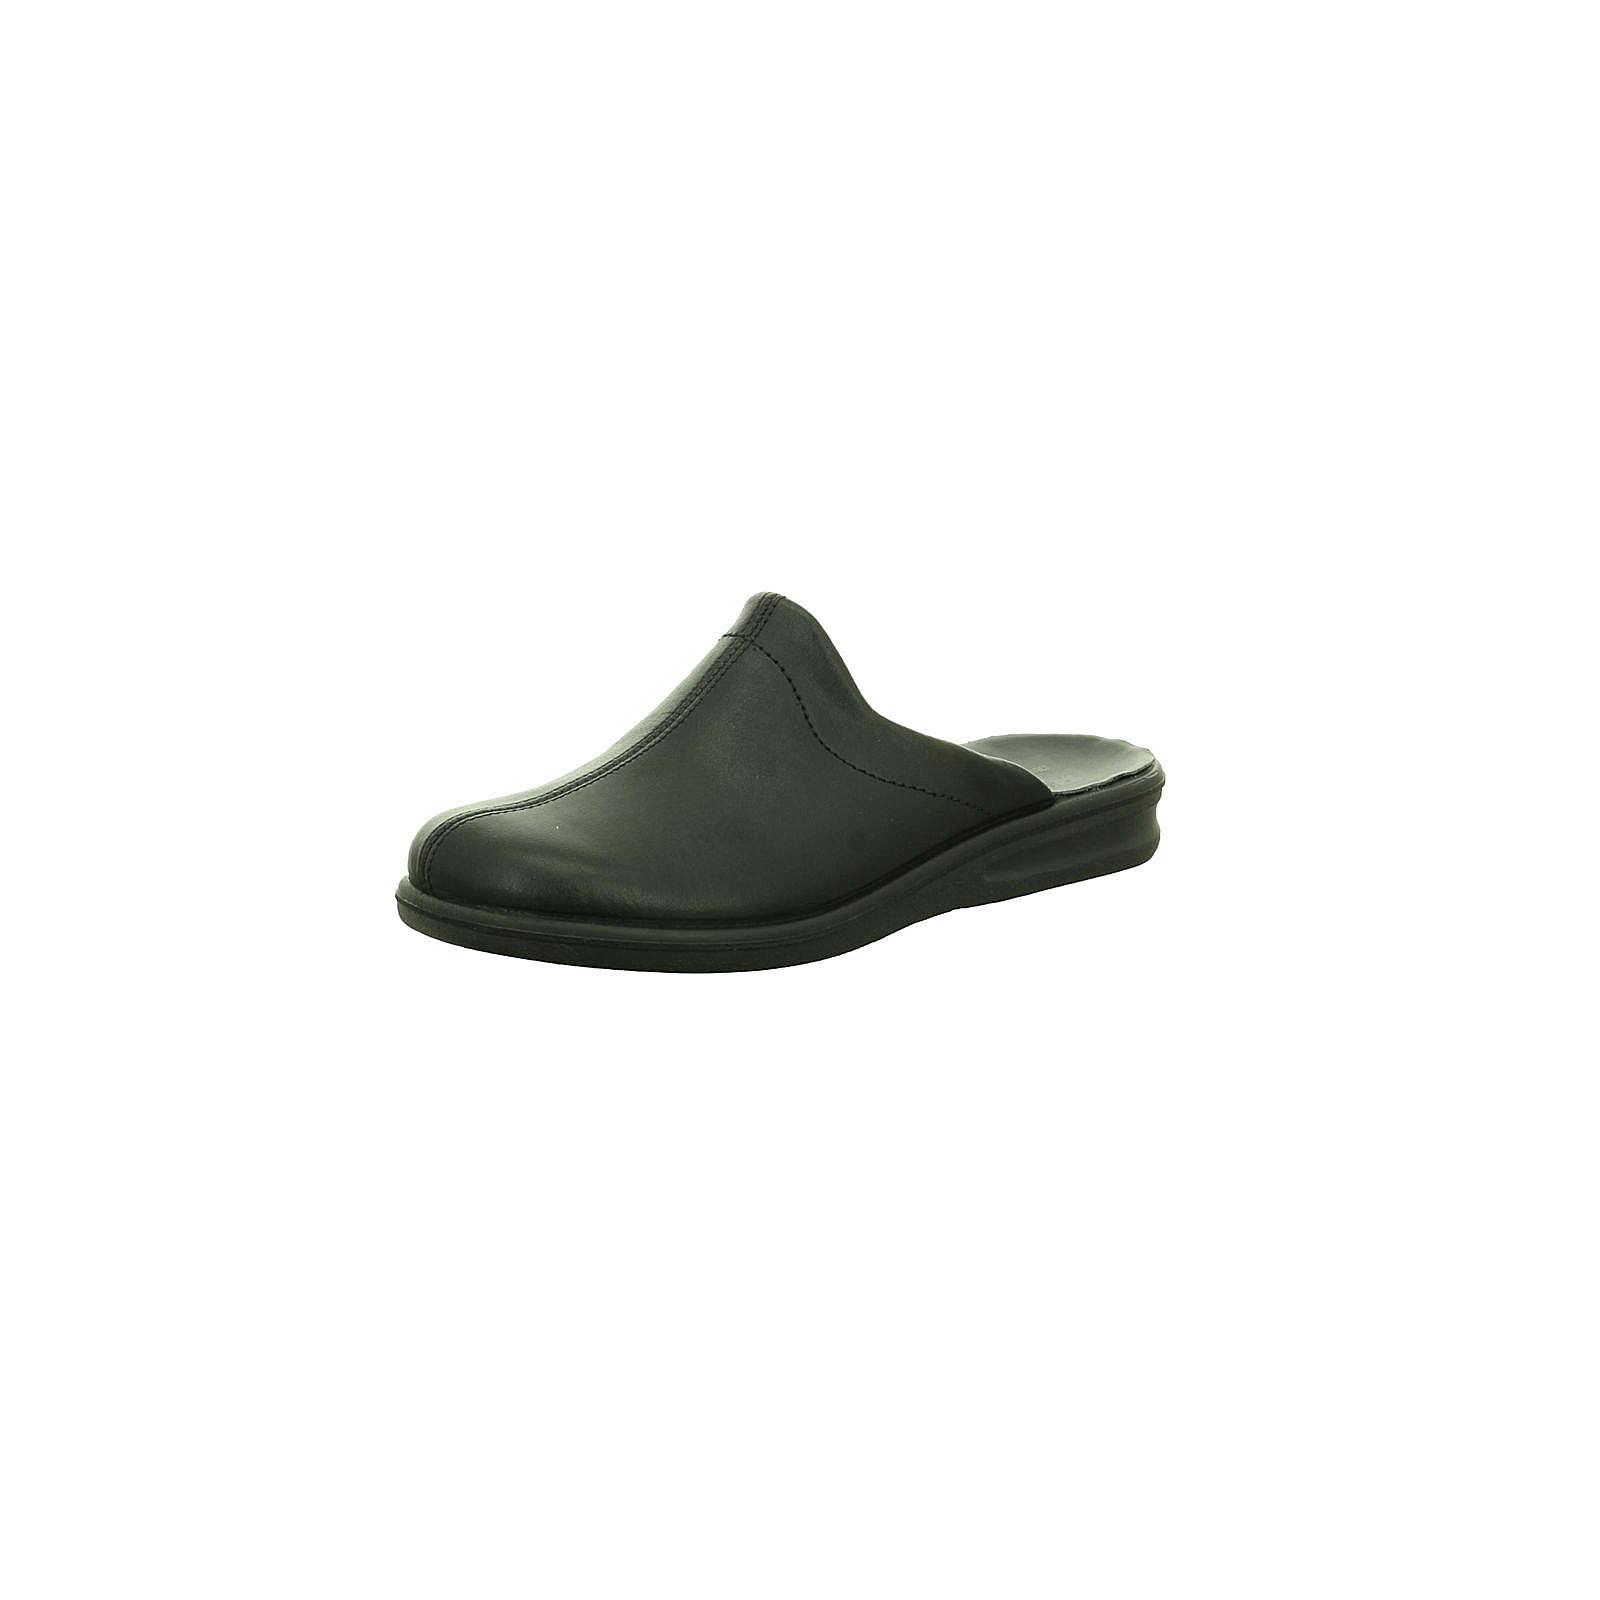 ROMIKA Pantoffeln schwarz Herren Gr. 44